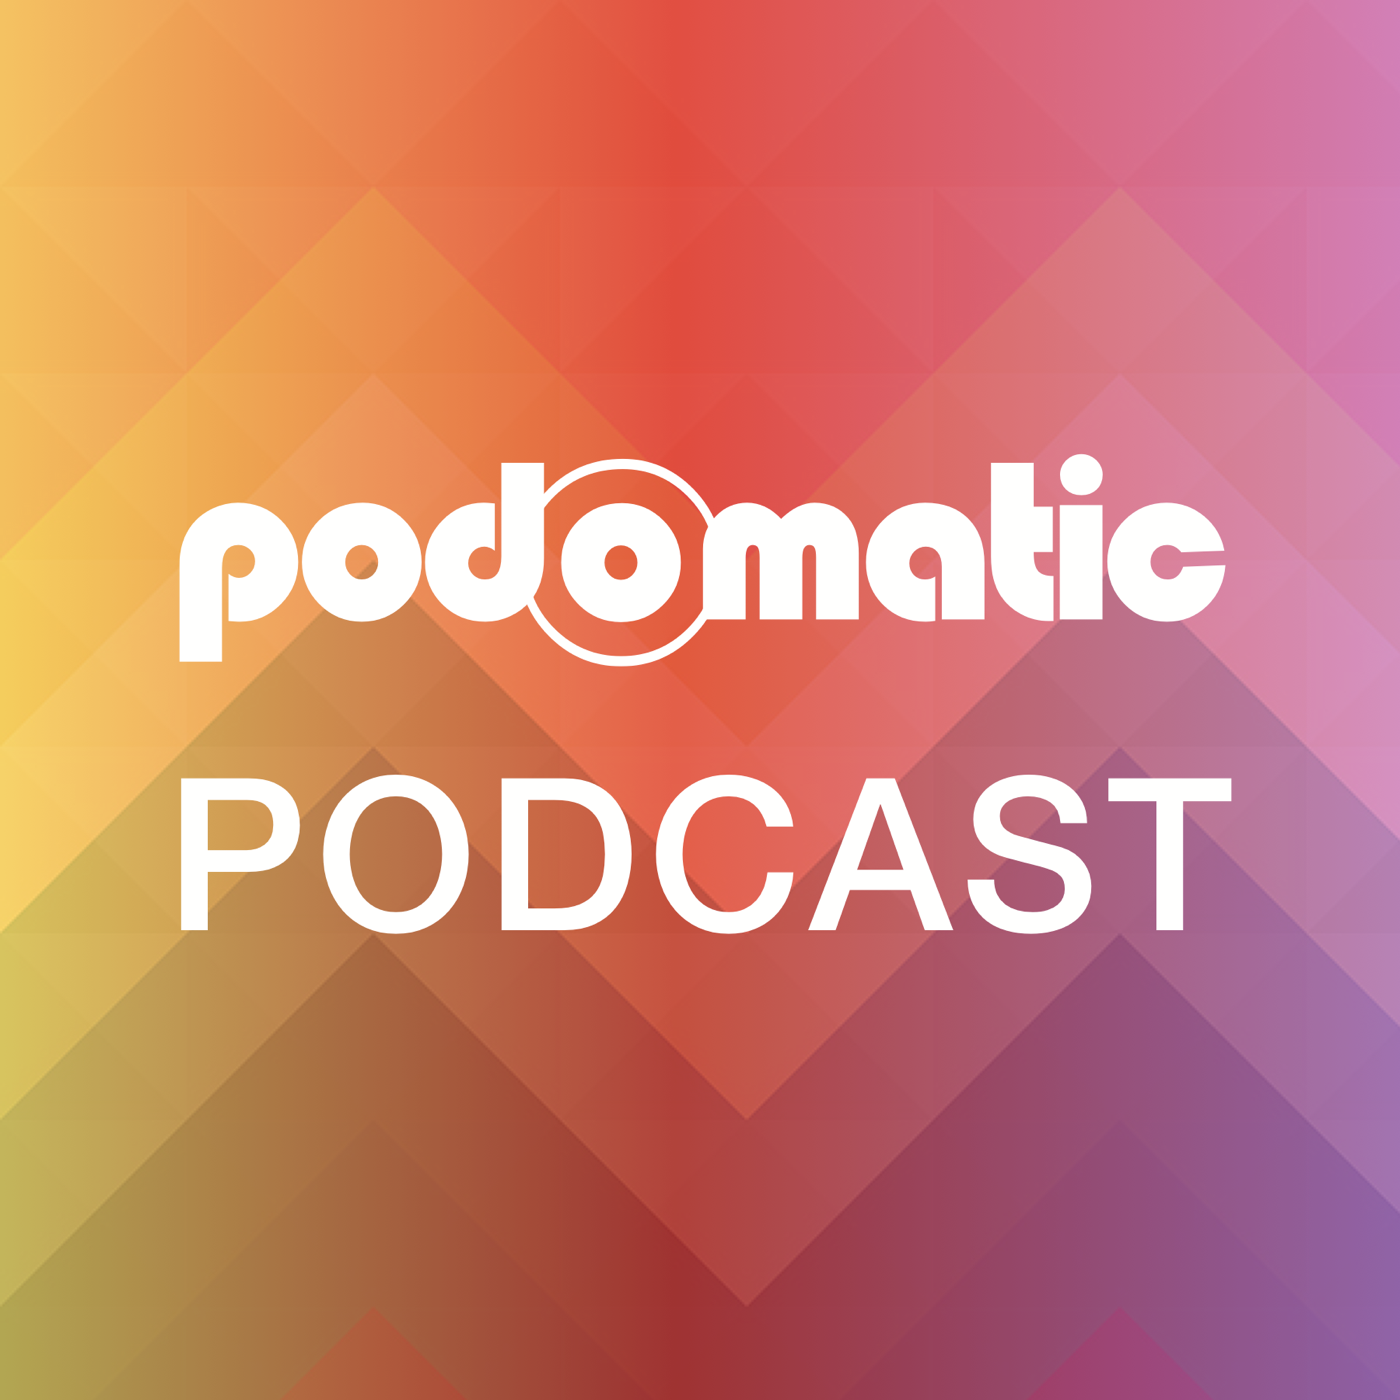 Vince Swann's Podcast